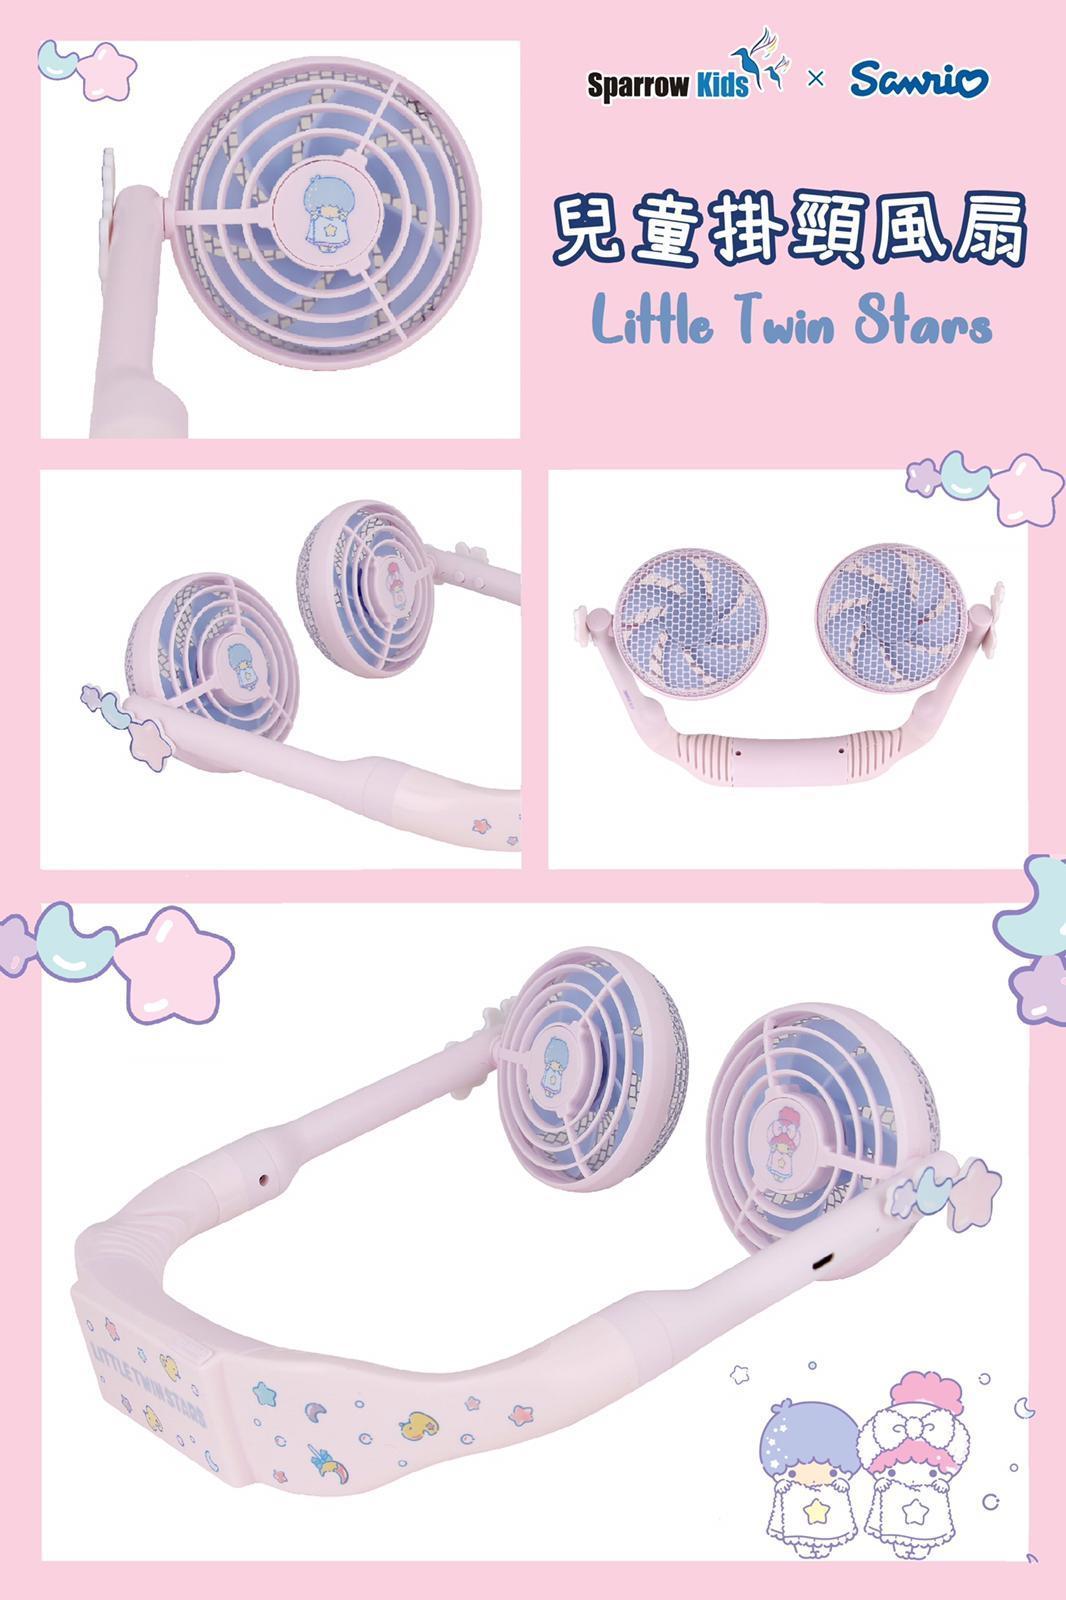 【Sanrio】 兒童卡通掛頸閃燈風扇-Little Twin Stars